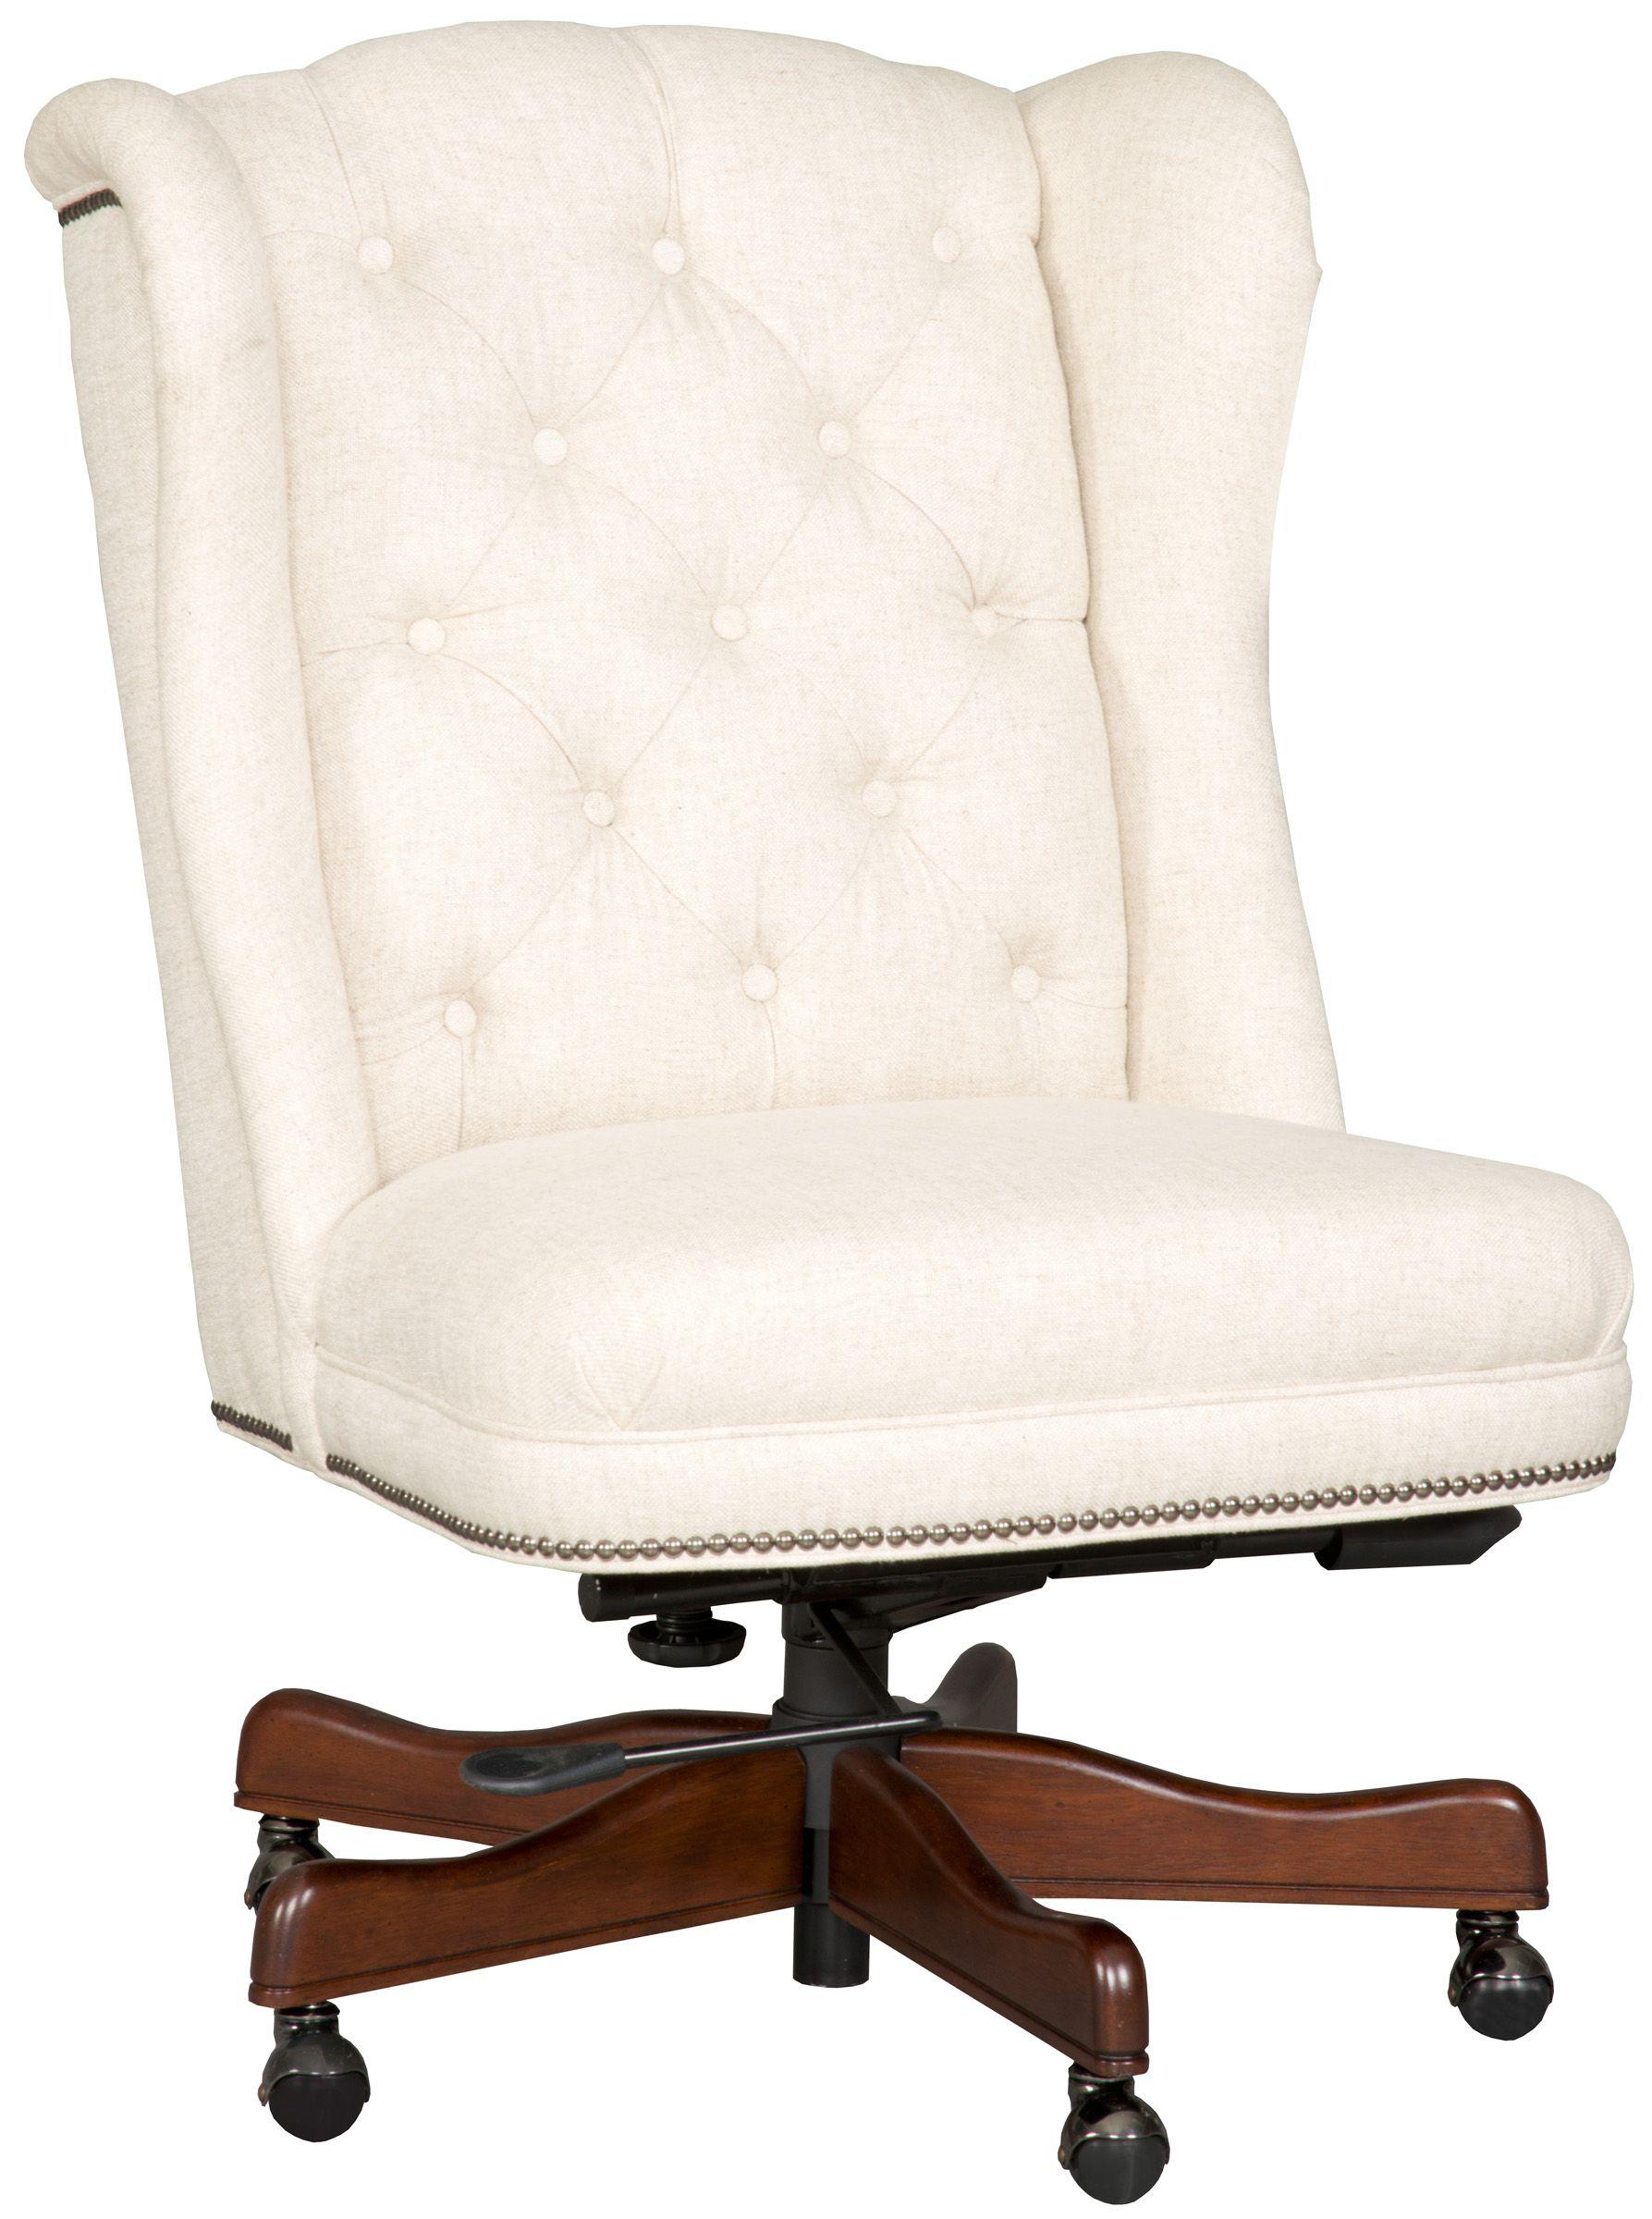 Amazing Hooker Furniture Ec Executive Swivel Tilt Chair Ec401 080 Evergreenethics Interior Chair Design Evergreenethicsorg